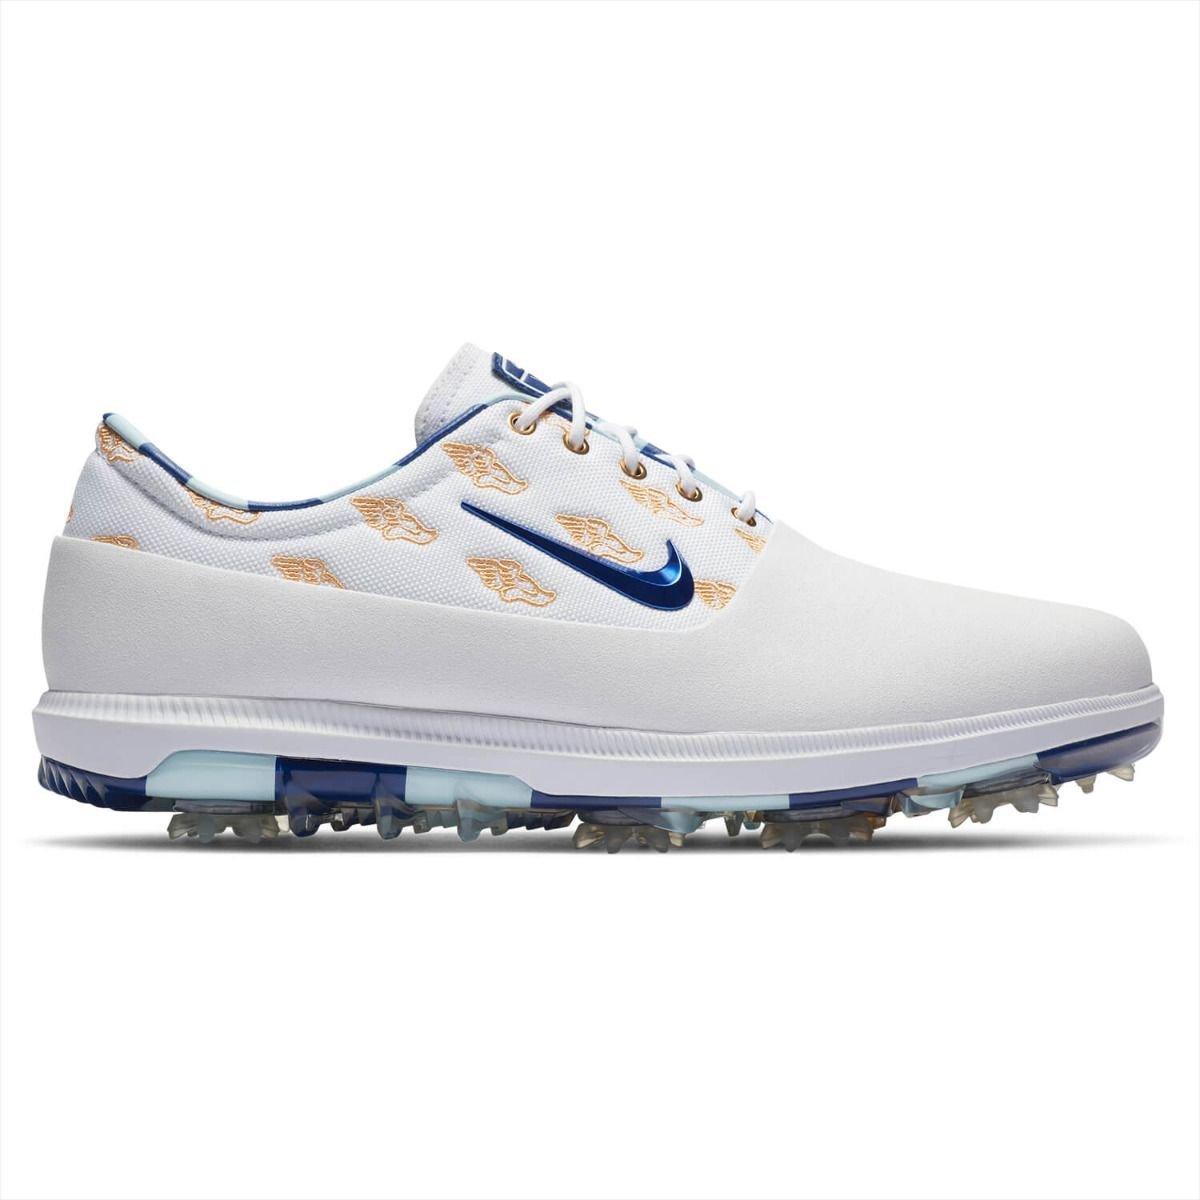 Nike Air Zoom Victory Tour NRG Golf